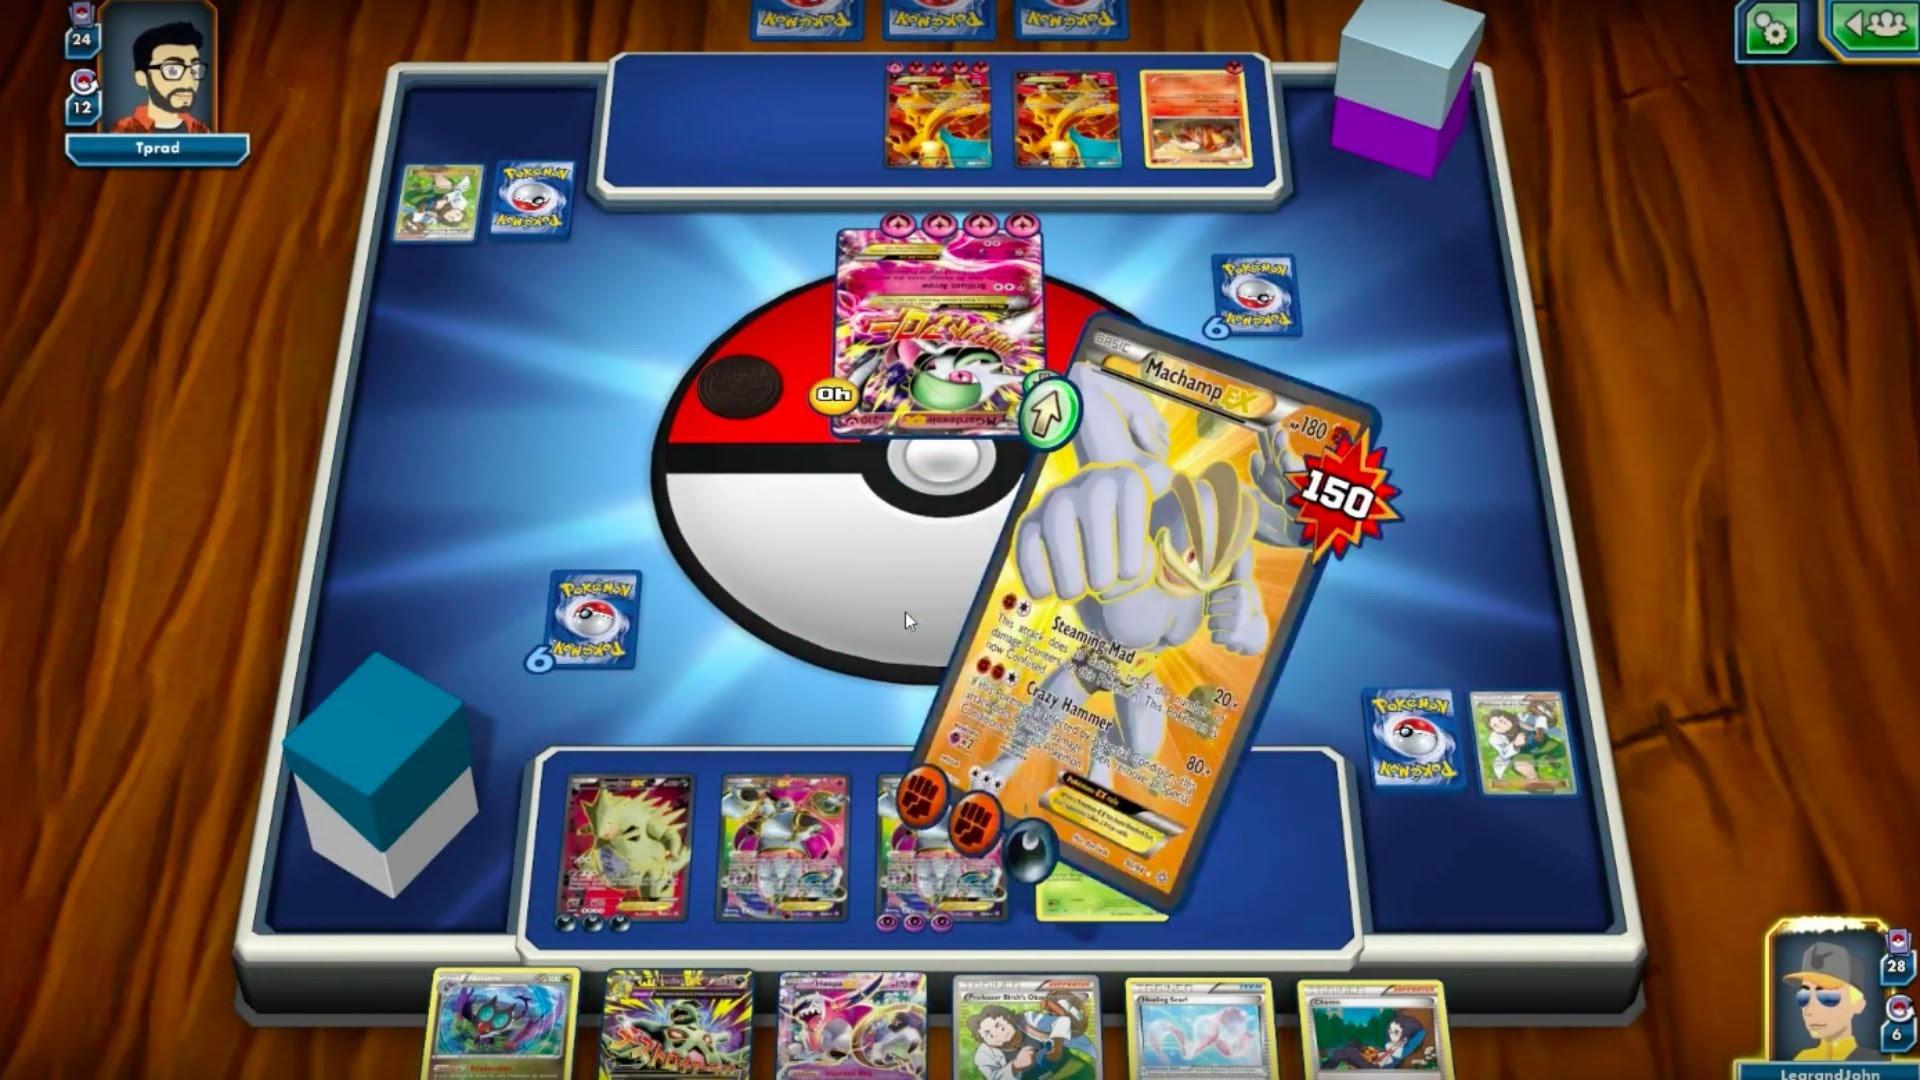 Download Pok\u00e9mon Trading Card Game Online 2.37.0 apk for